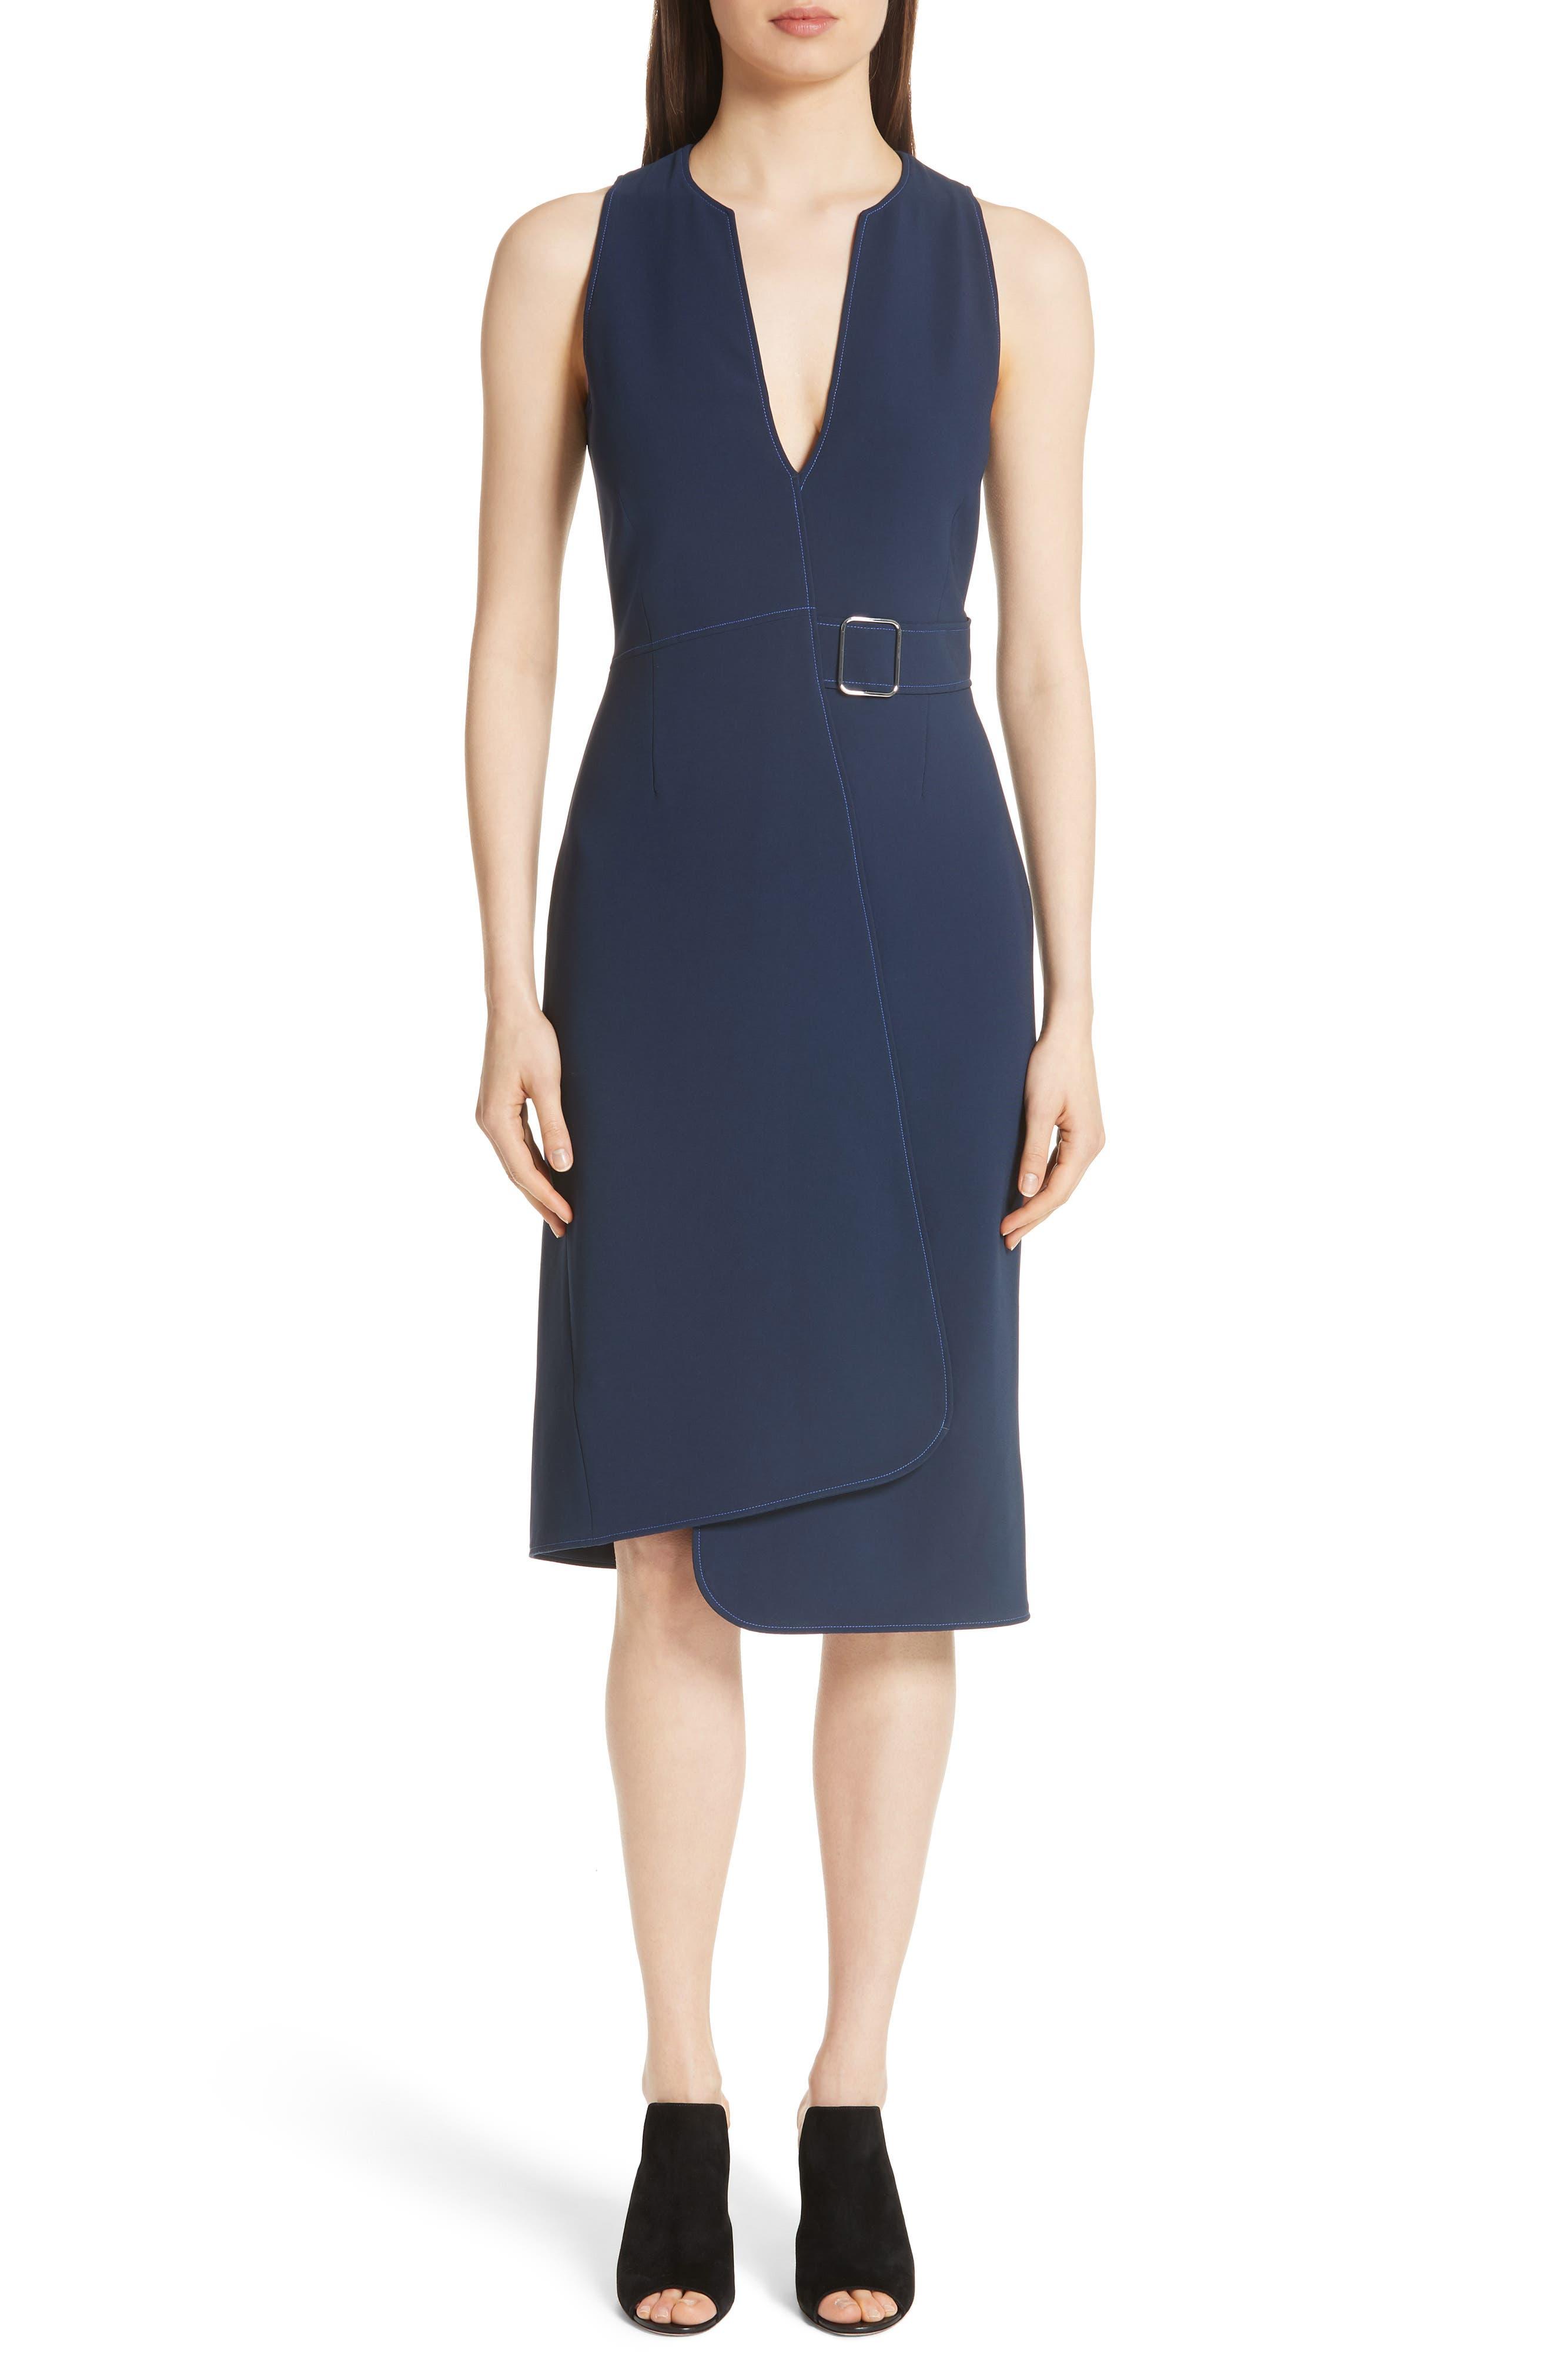 Alternate Image 1 Selected - Altuzarra Asymmetrical Belted Dress